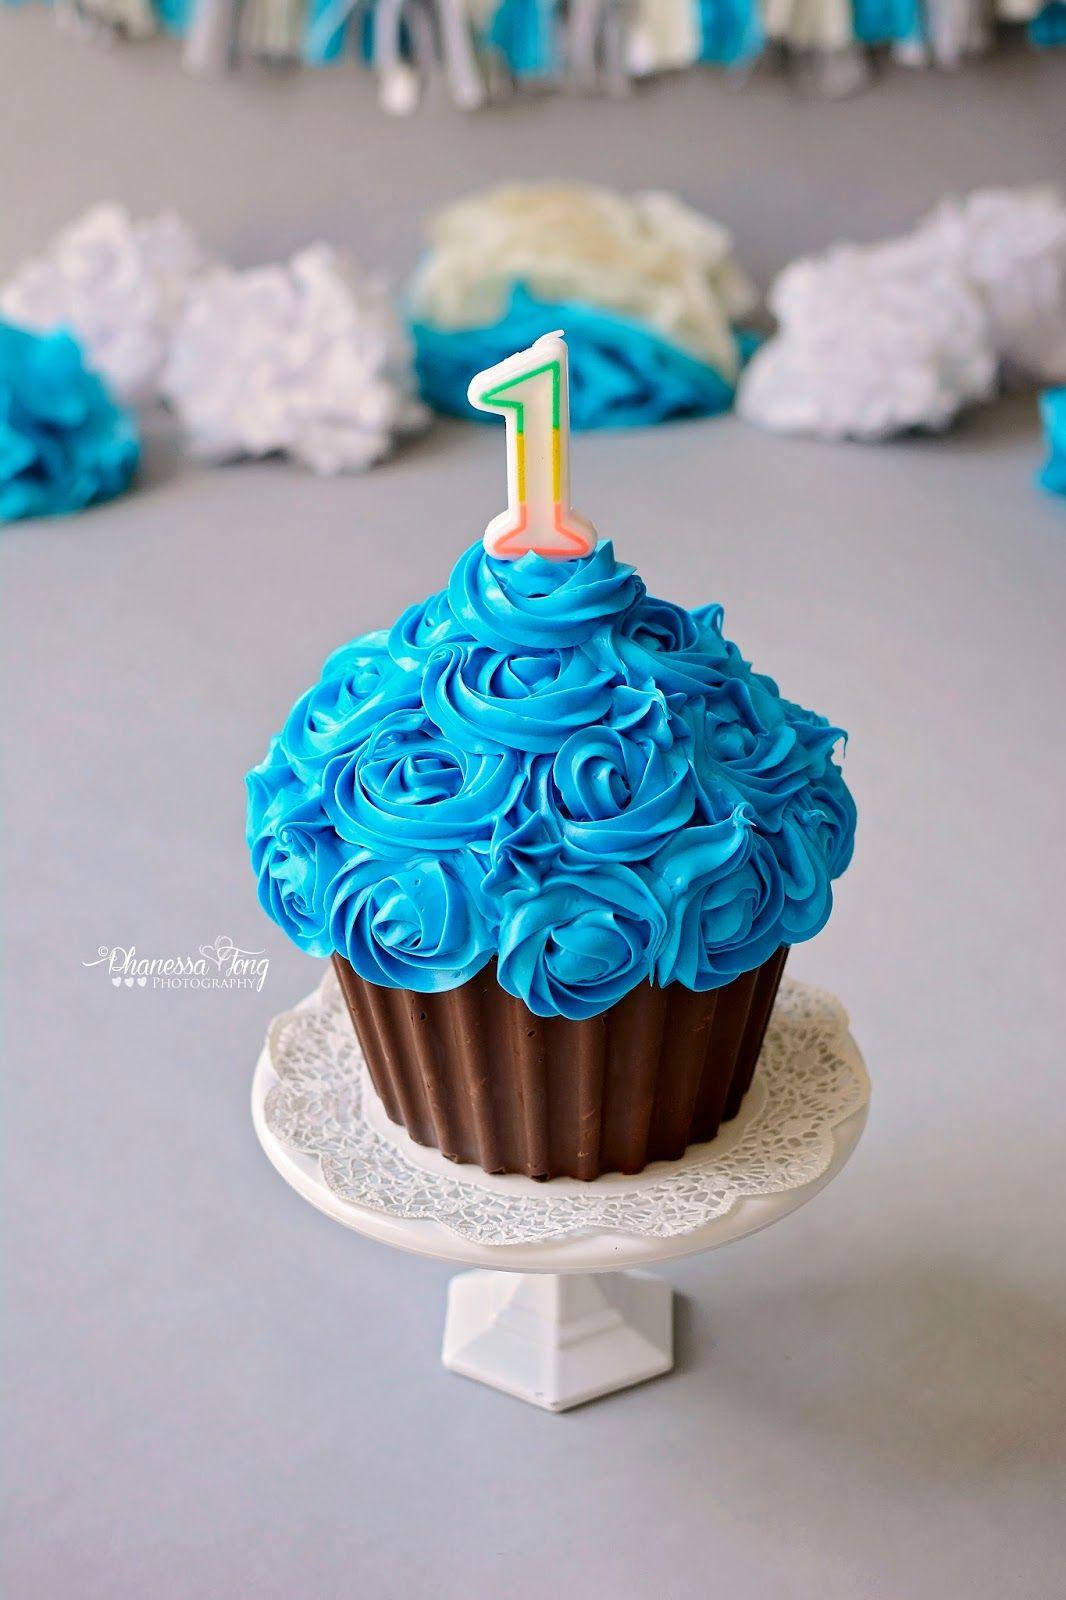 How To Make A Cupcake Smash Cake